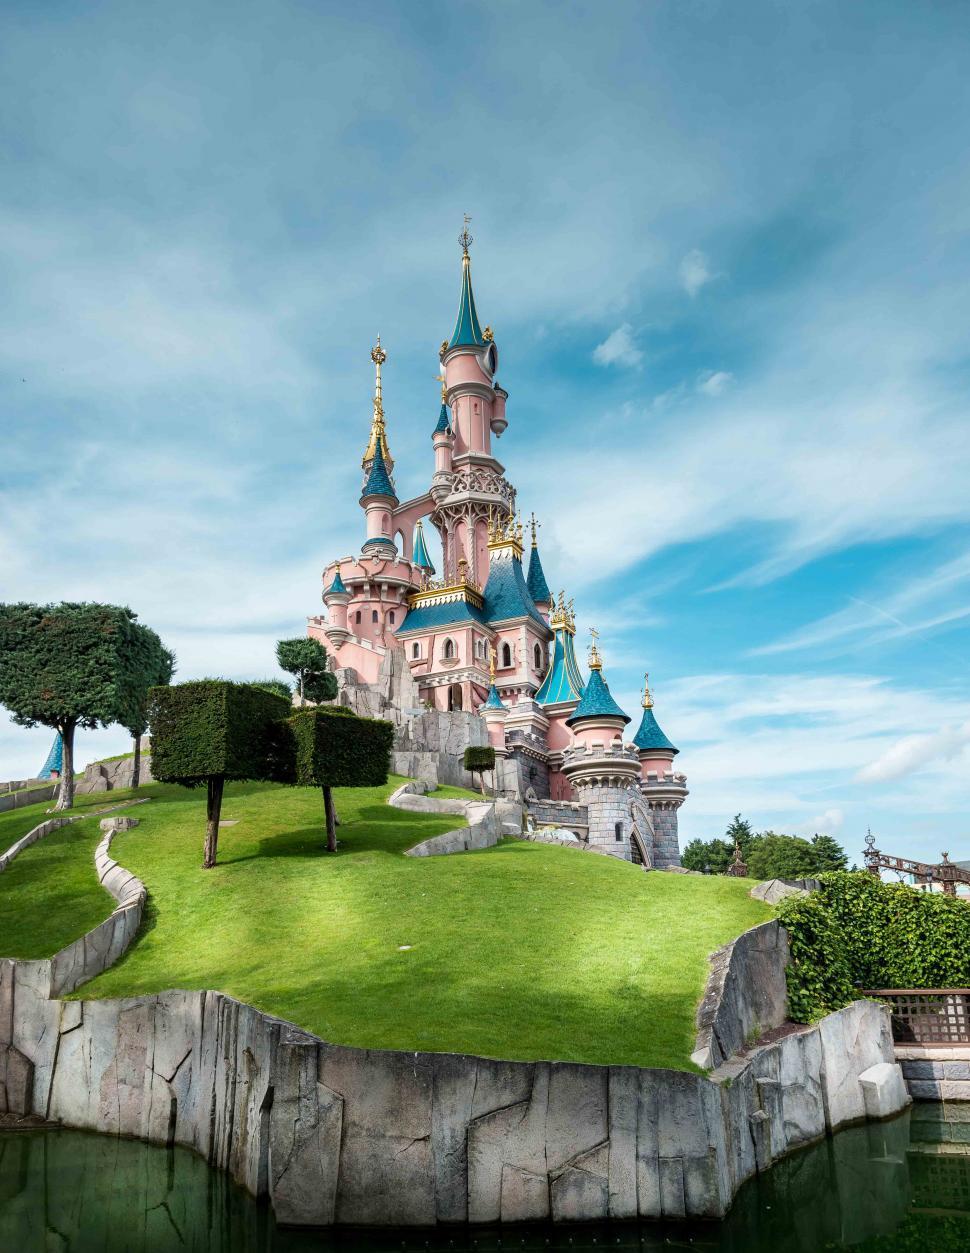 Download Free Stock HD Photo of Disneyland's dreamland in paris Disneyland Online